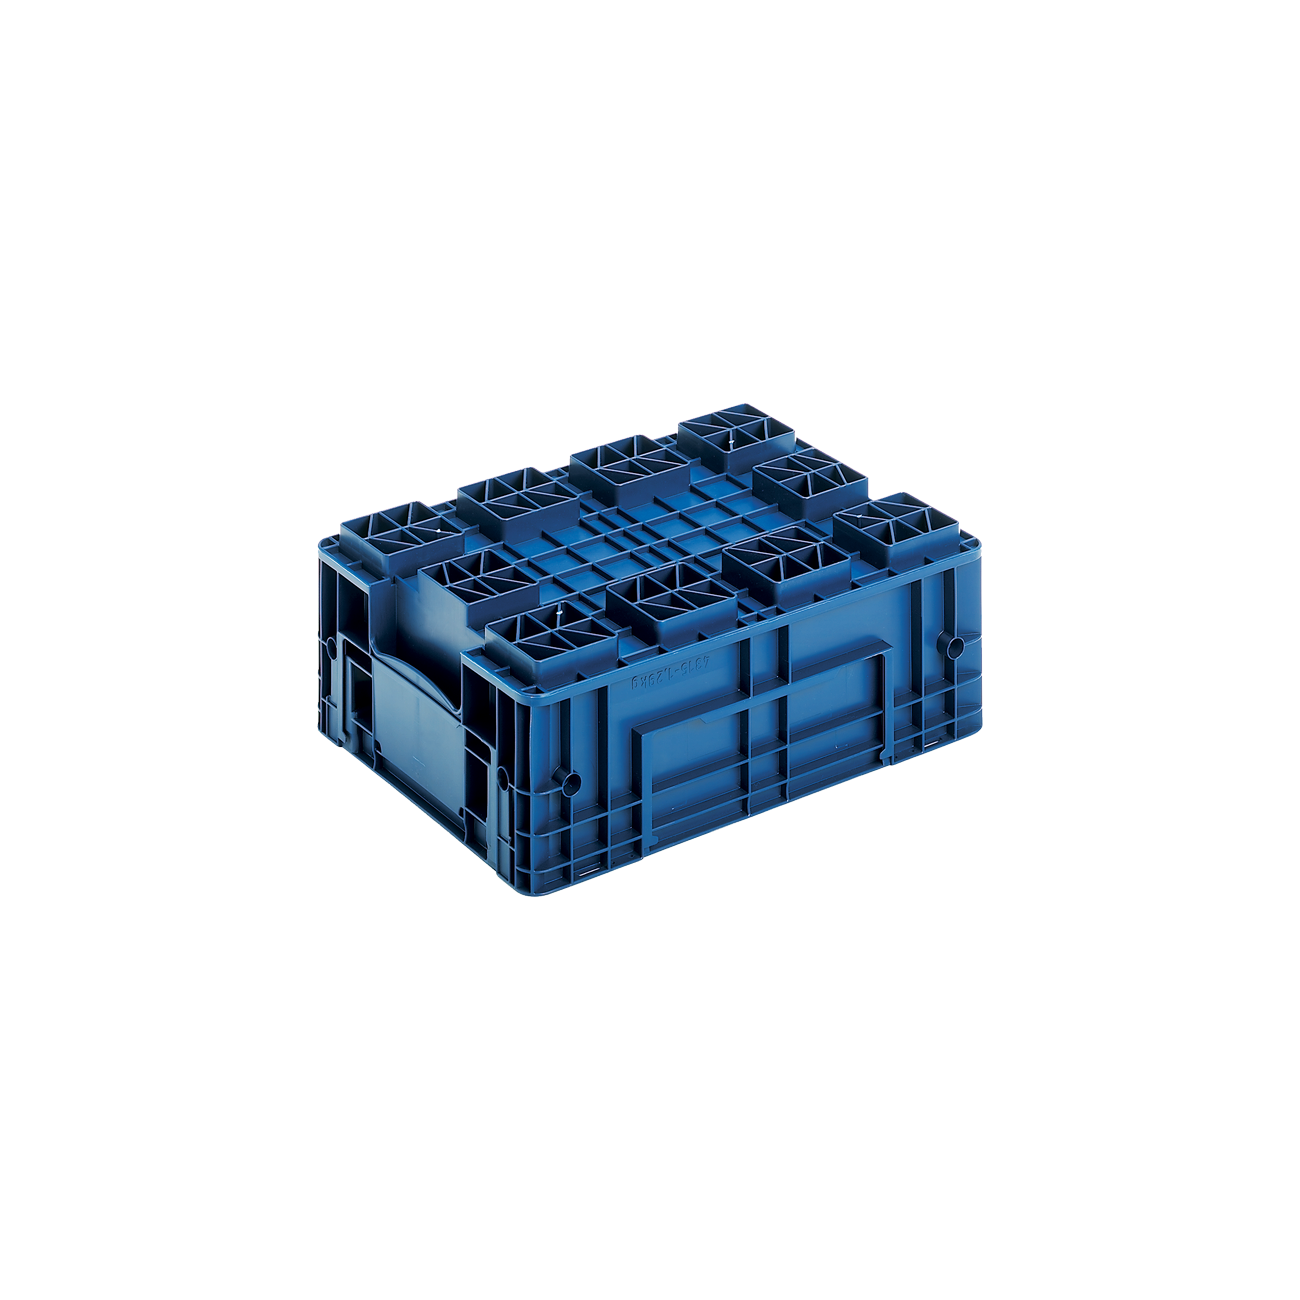 Plastic Container VDA-R-KLT 4318, Automotive Industry